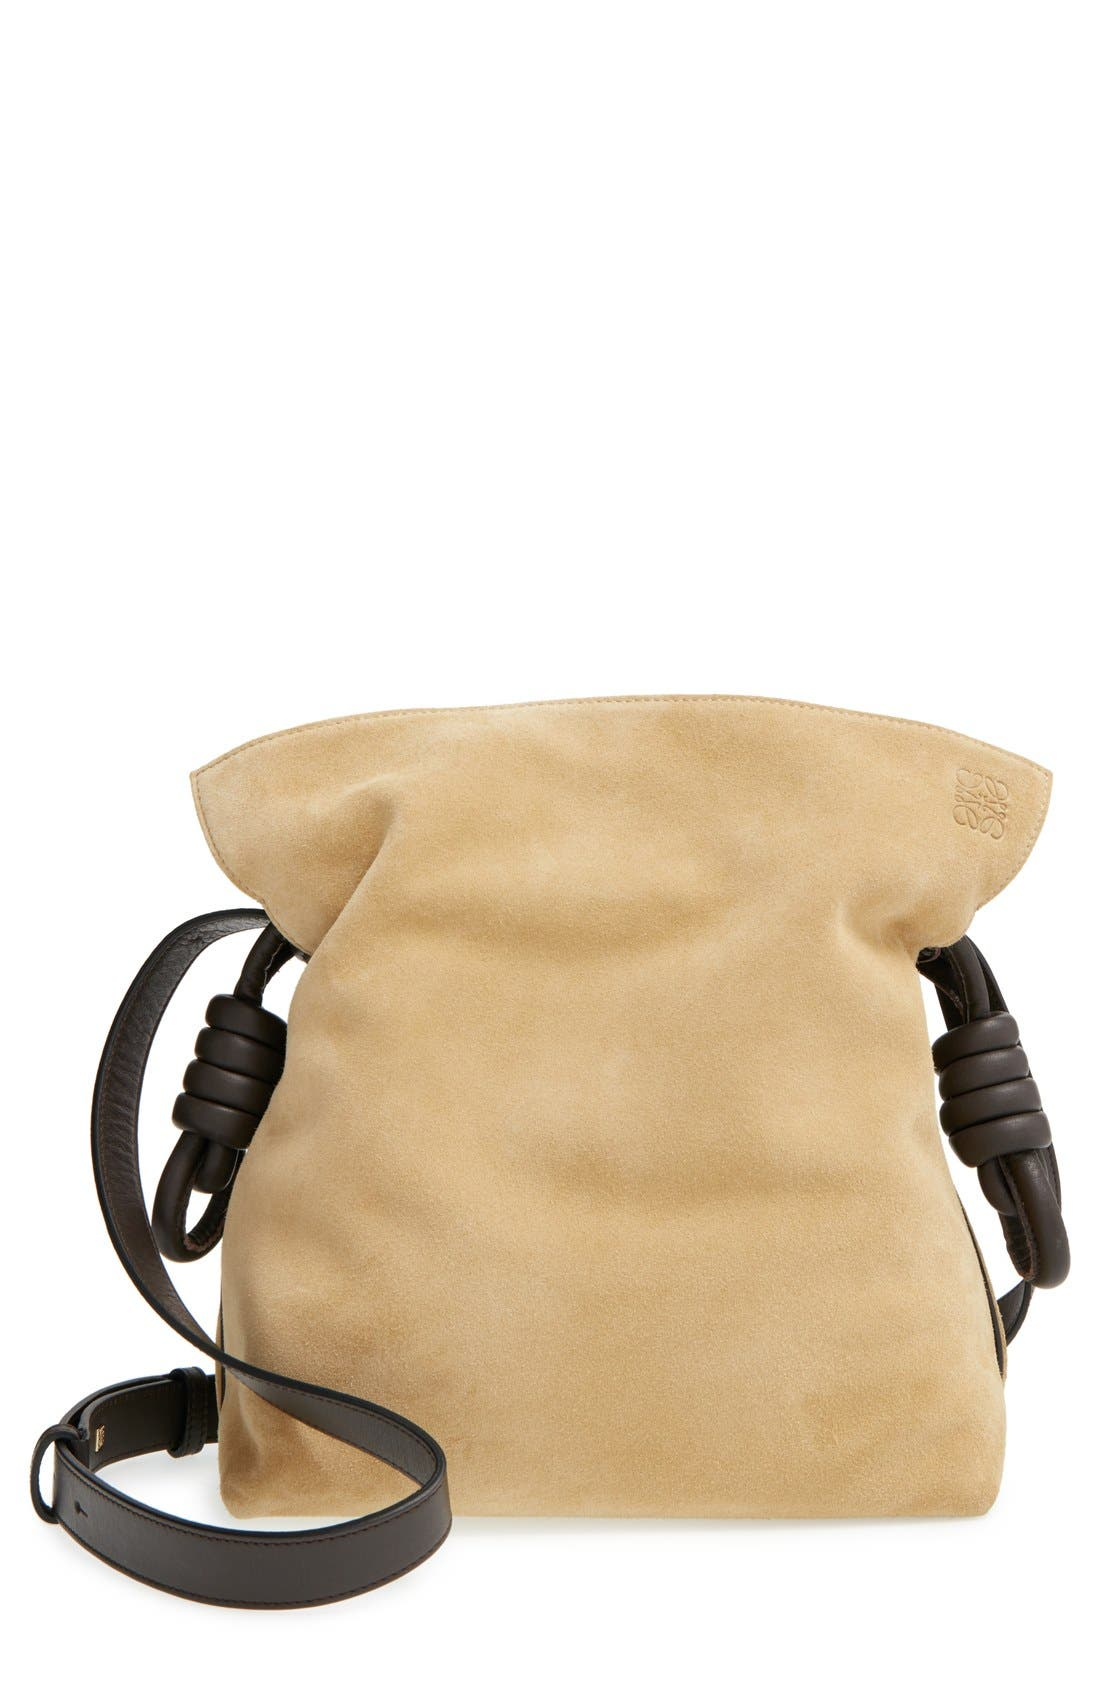 'Flamenco Knot' Suede & Calfskin Leather Bag, Main, color, 250